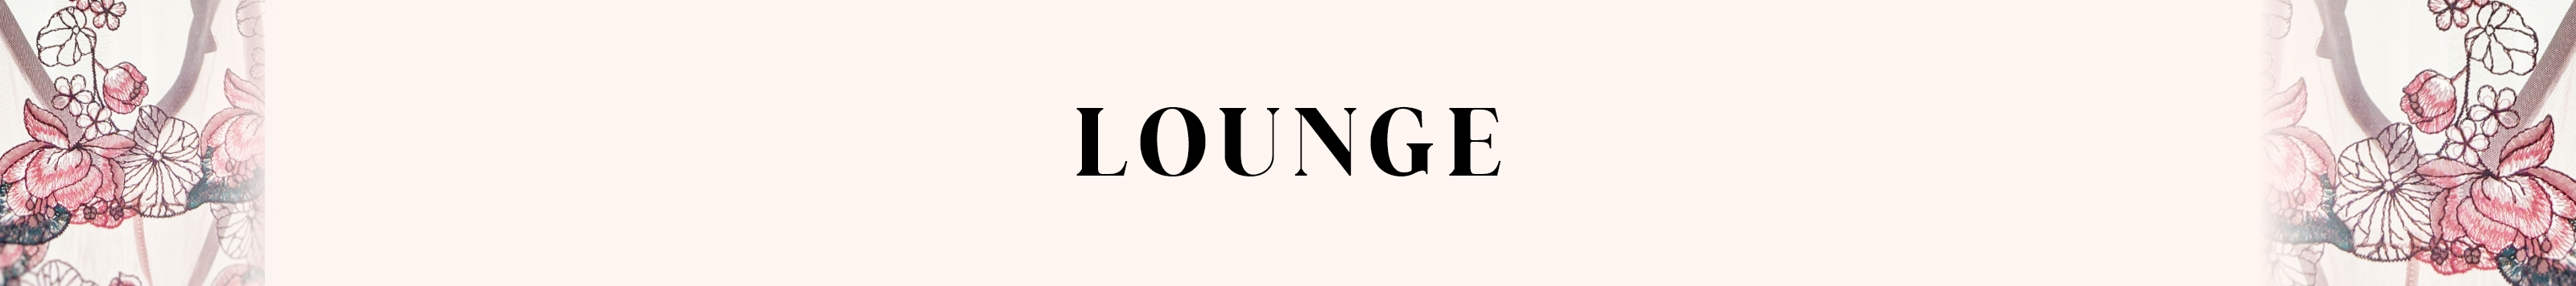 banner-category-lounge-1.jpg